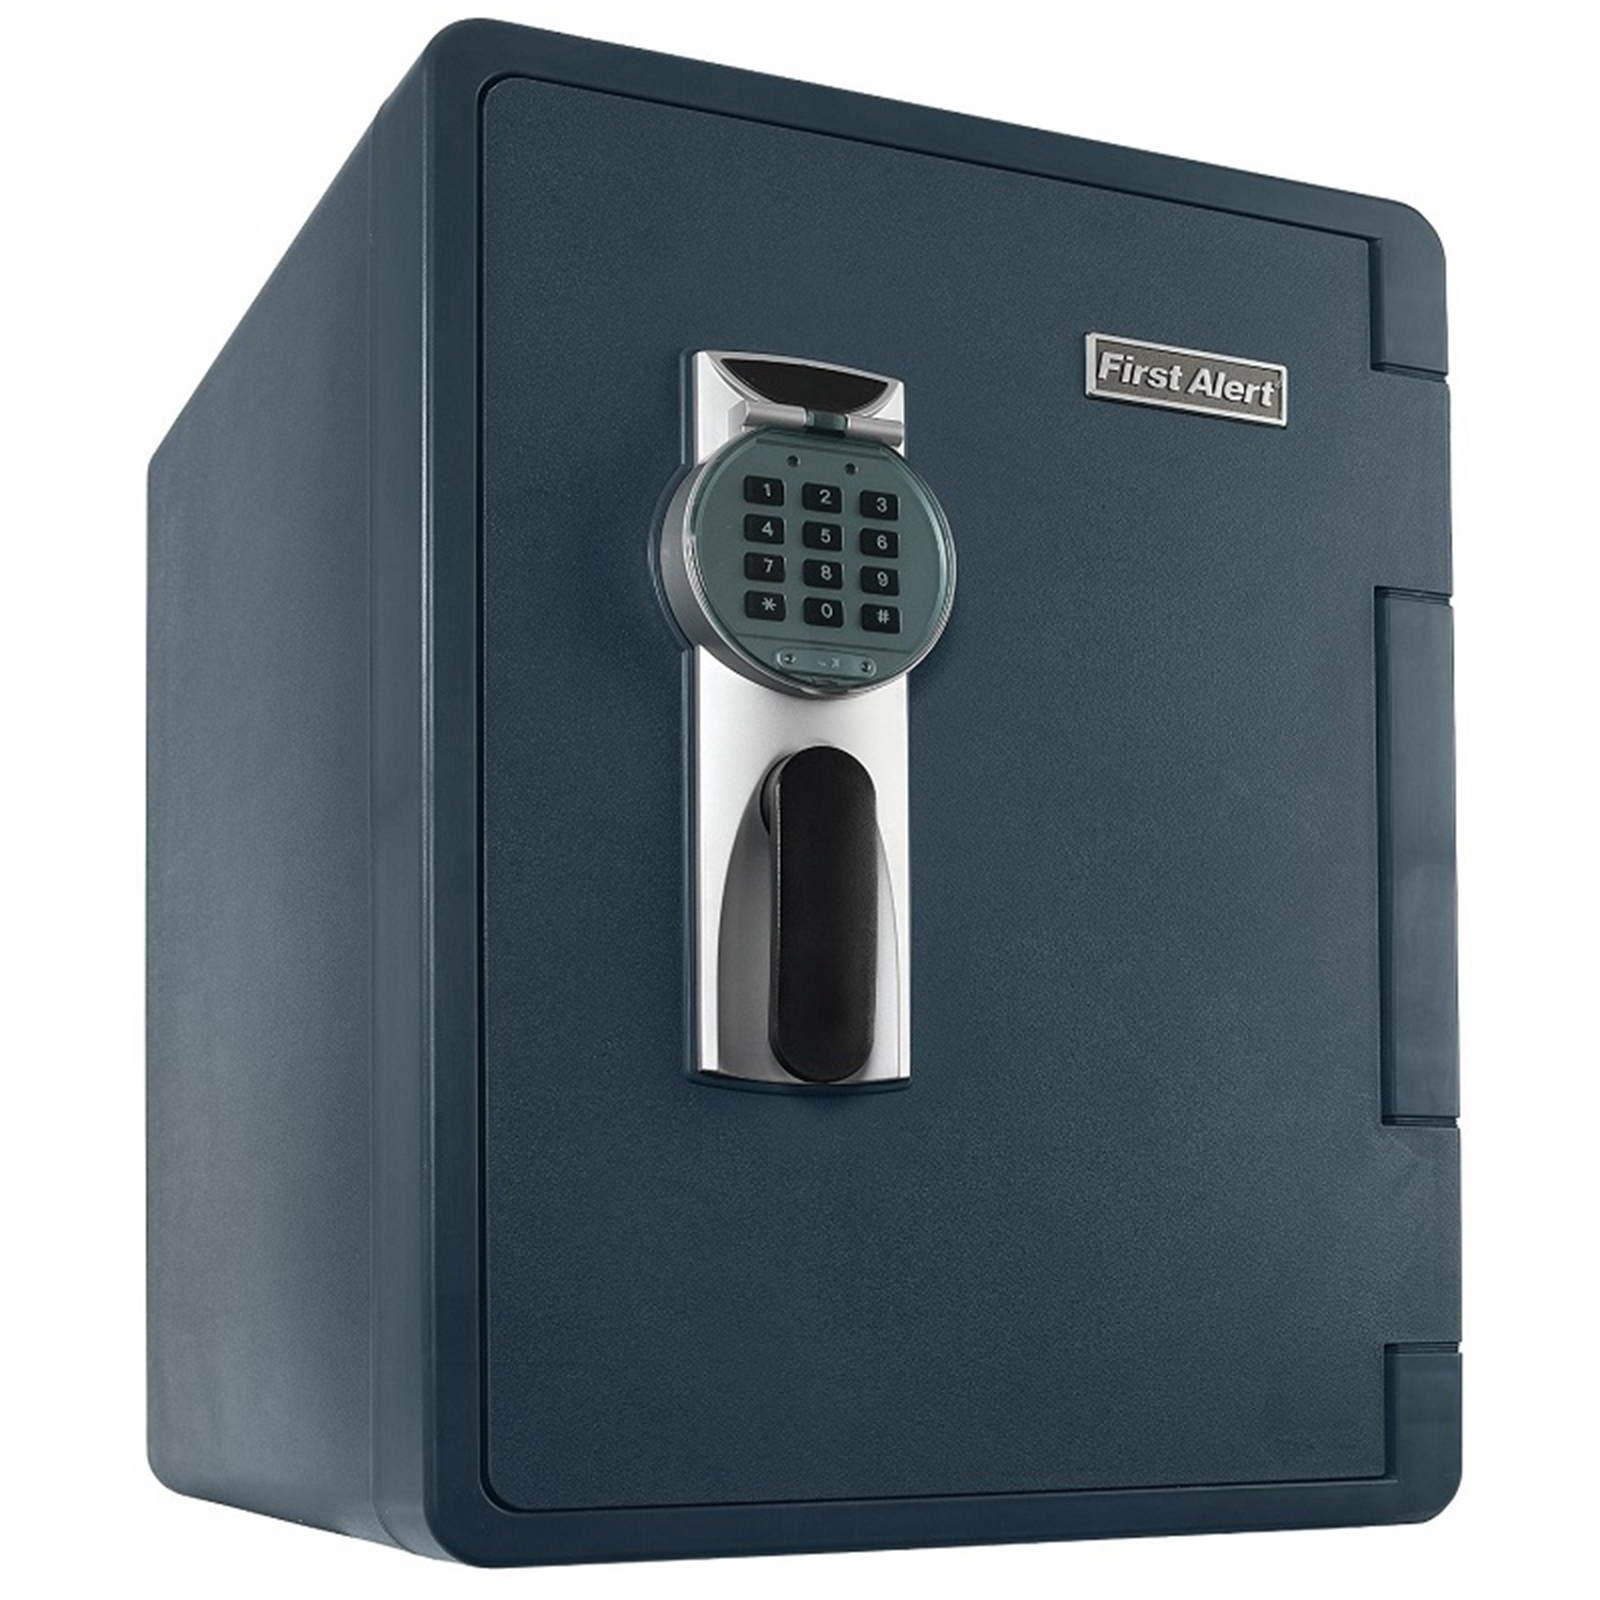 First Alert 59.5L Digital Waterproof Fire Resistant Safe